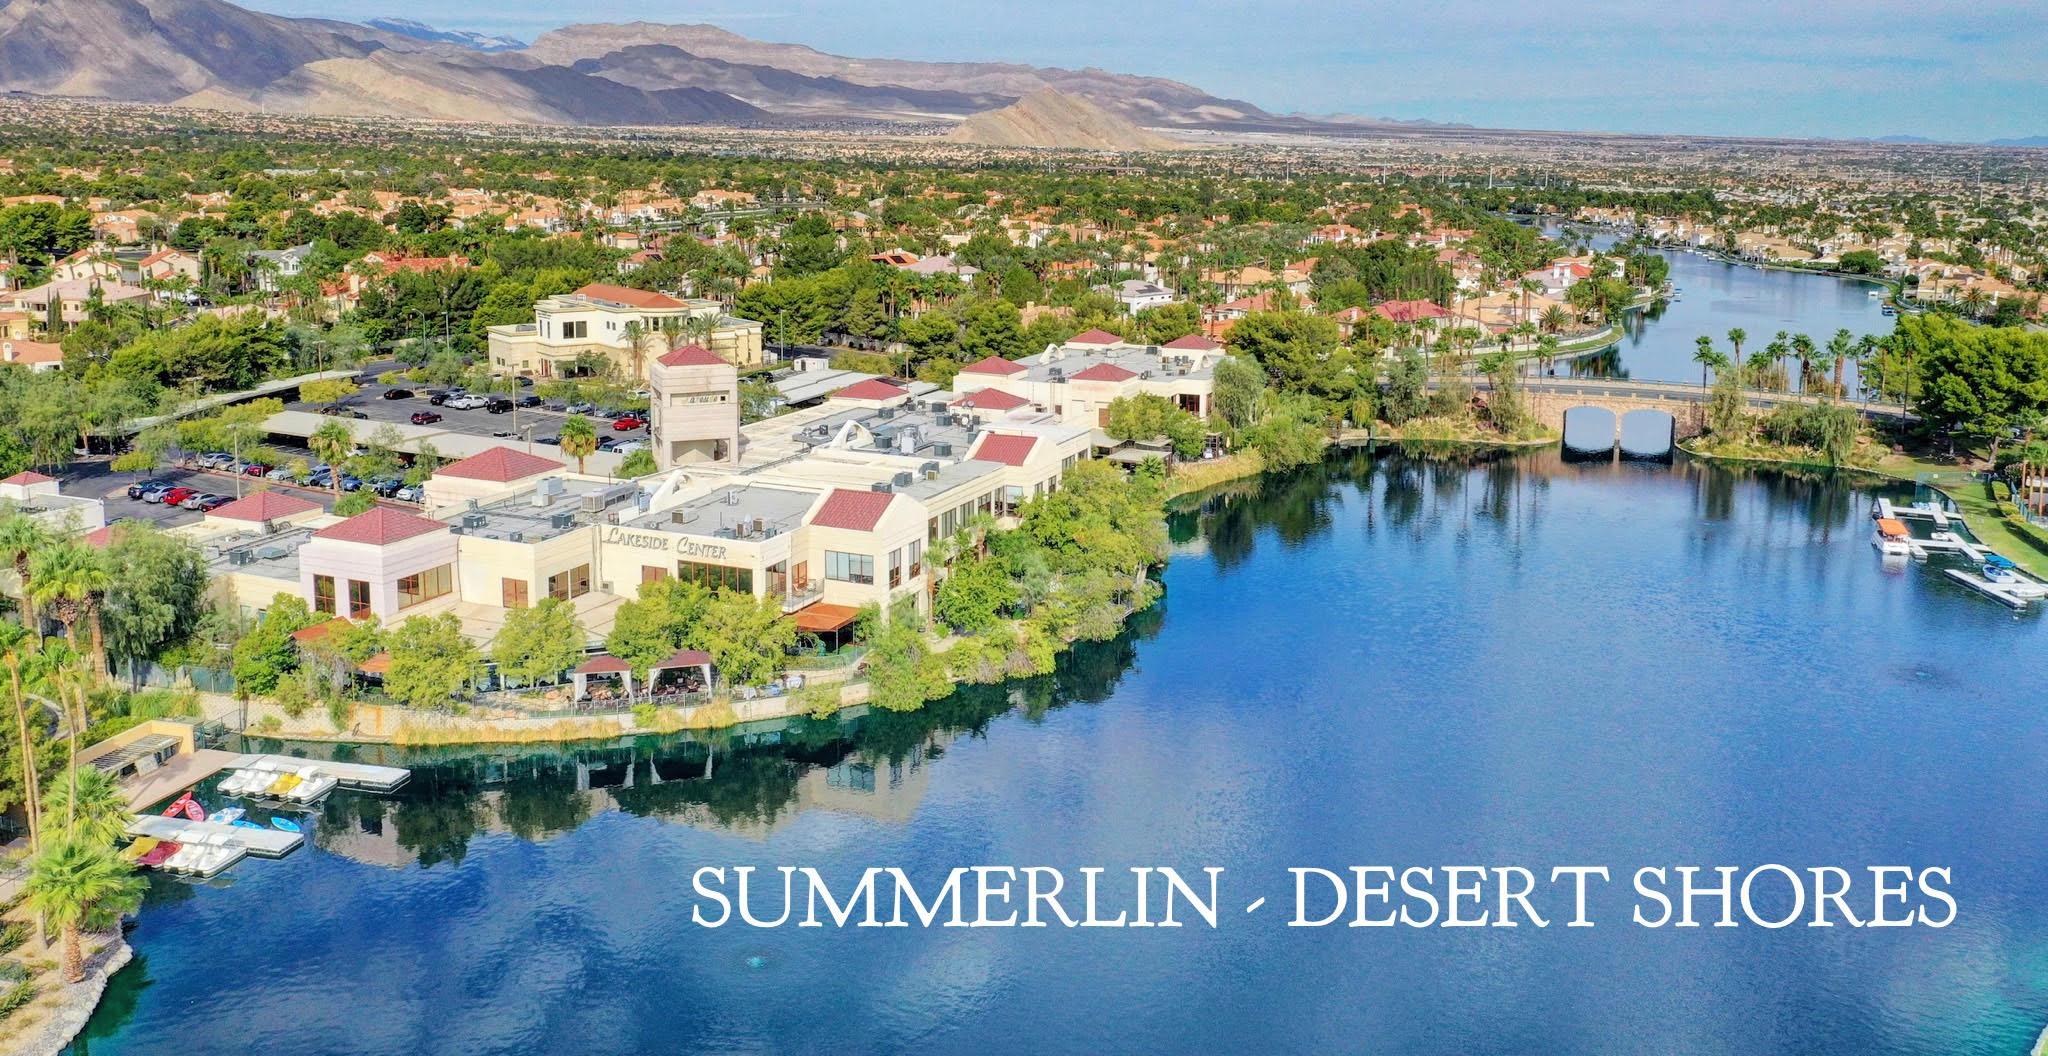 Lakeside Village Summerlin Desert Shores Aerial View